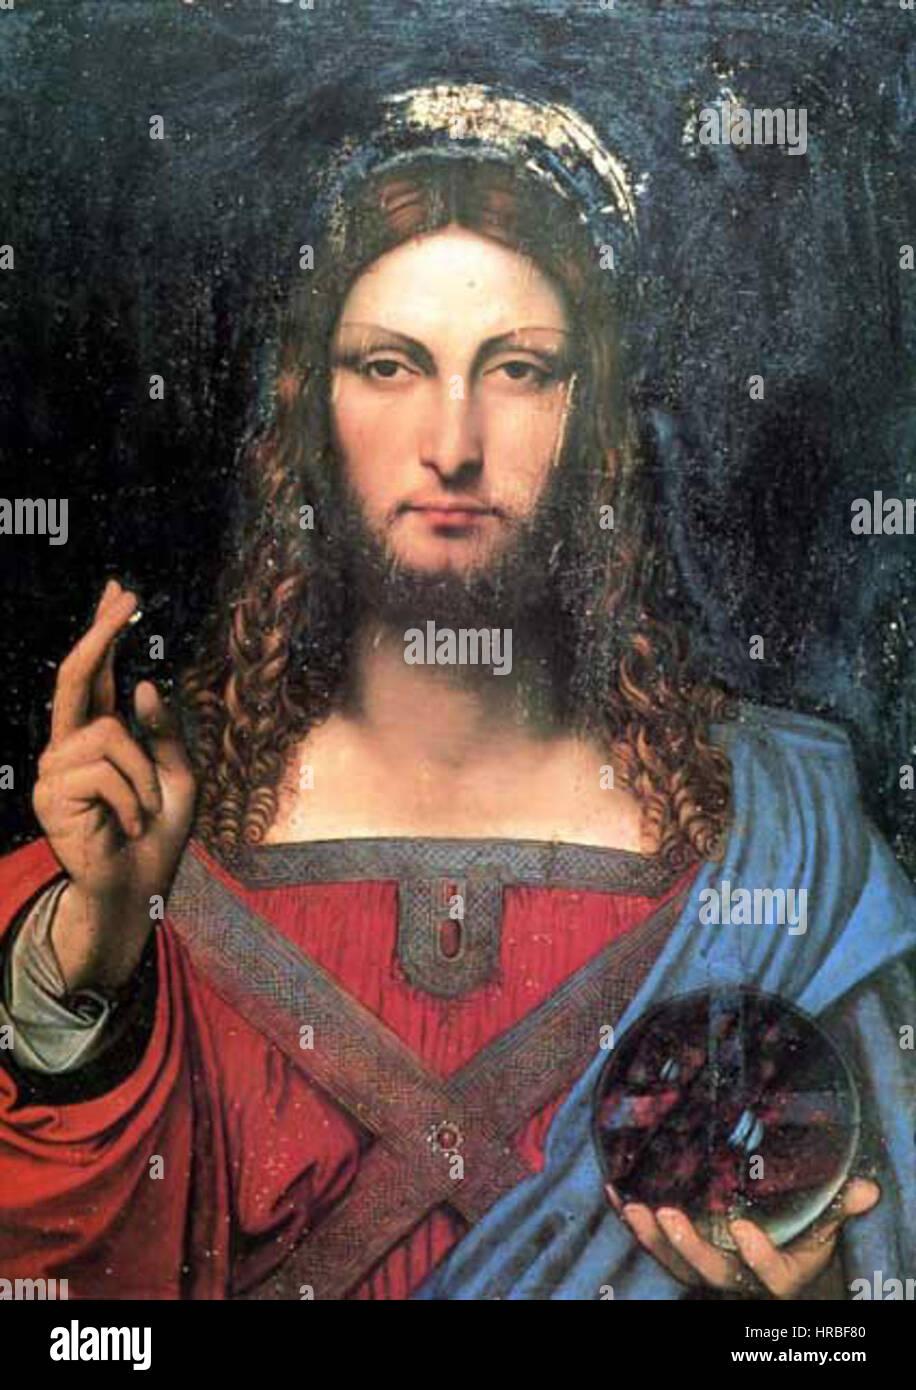 Salvator Mundi Ganay >> Salvator Mundi Ganay Stock Photo 134863120 Alamy